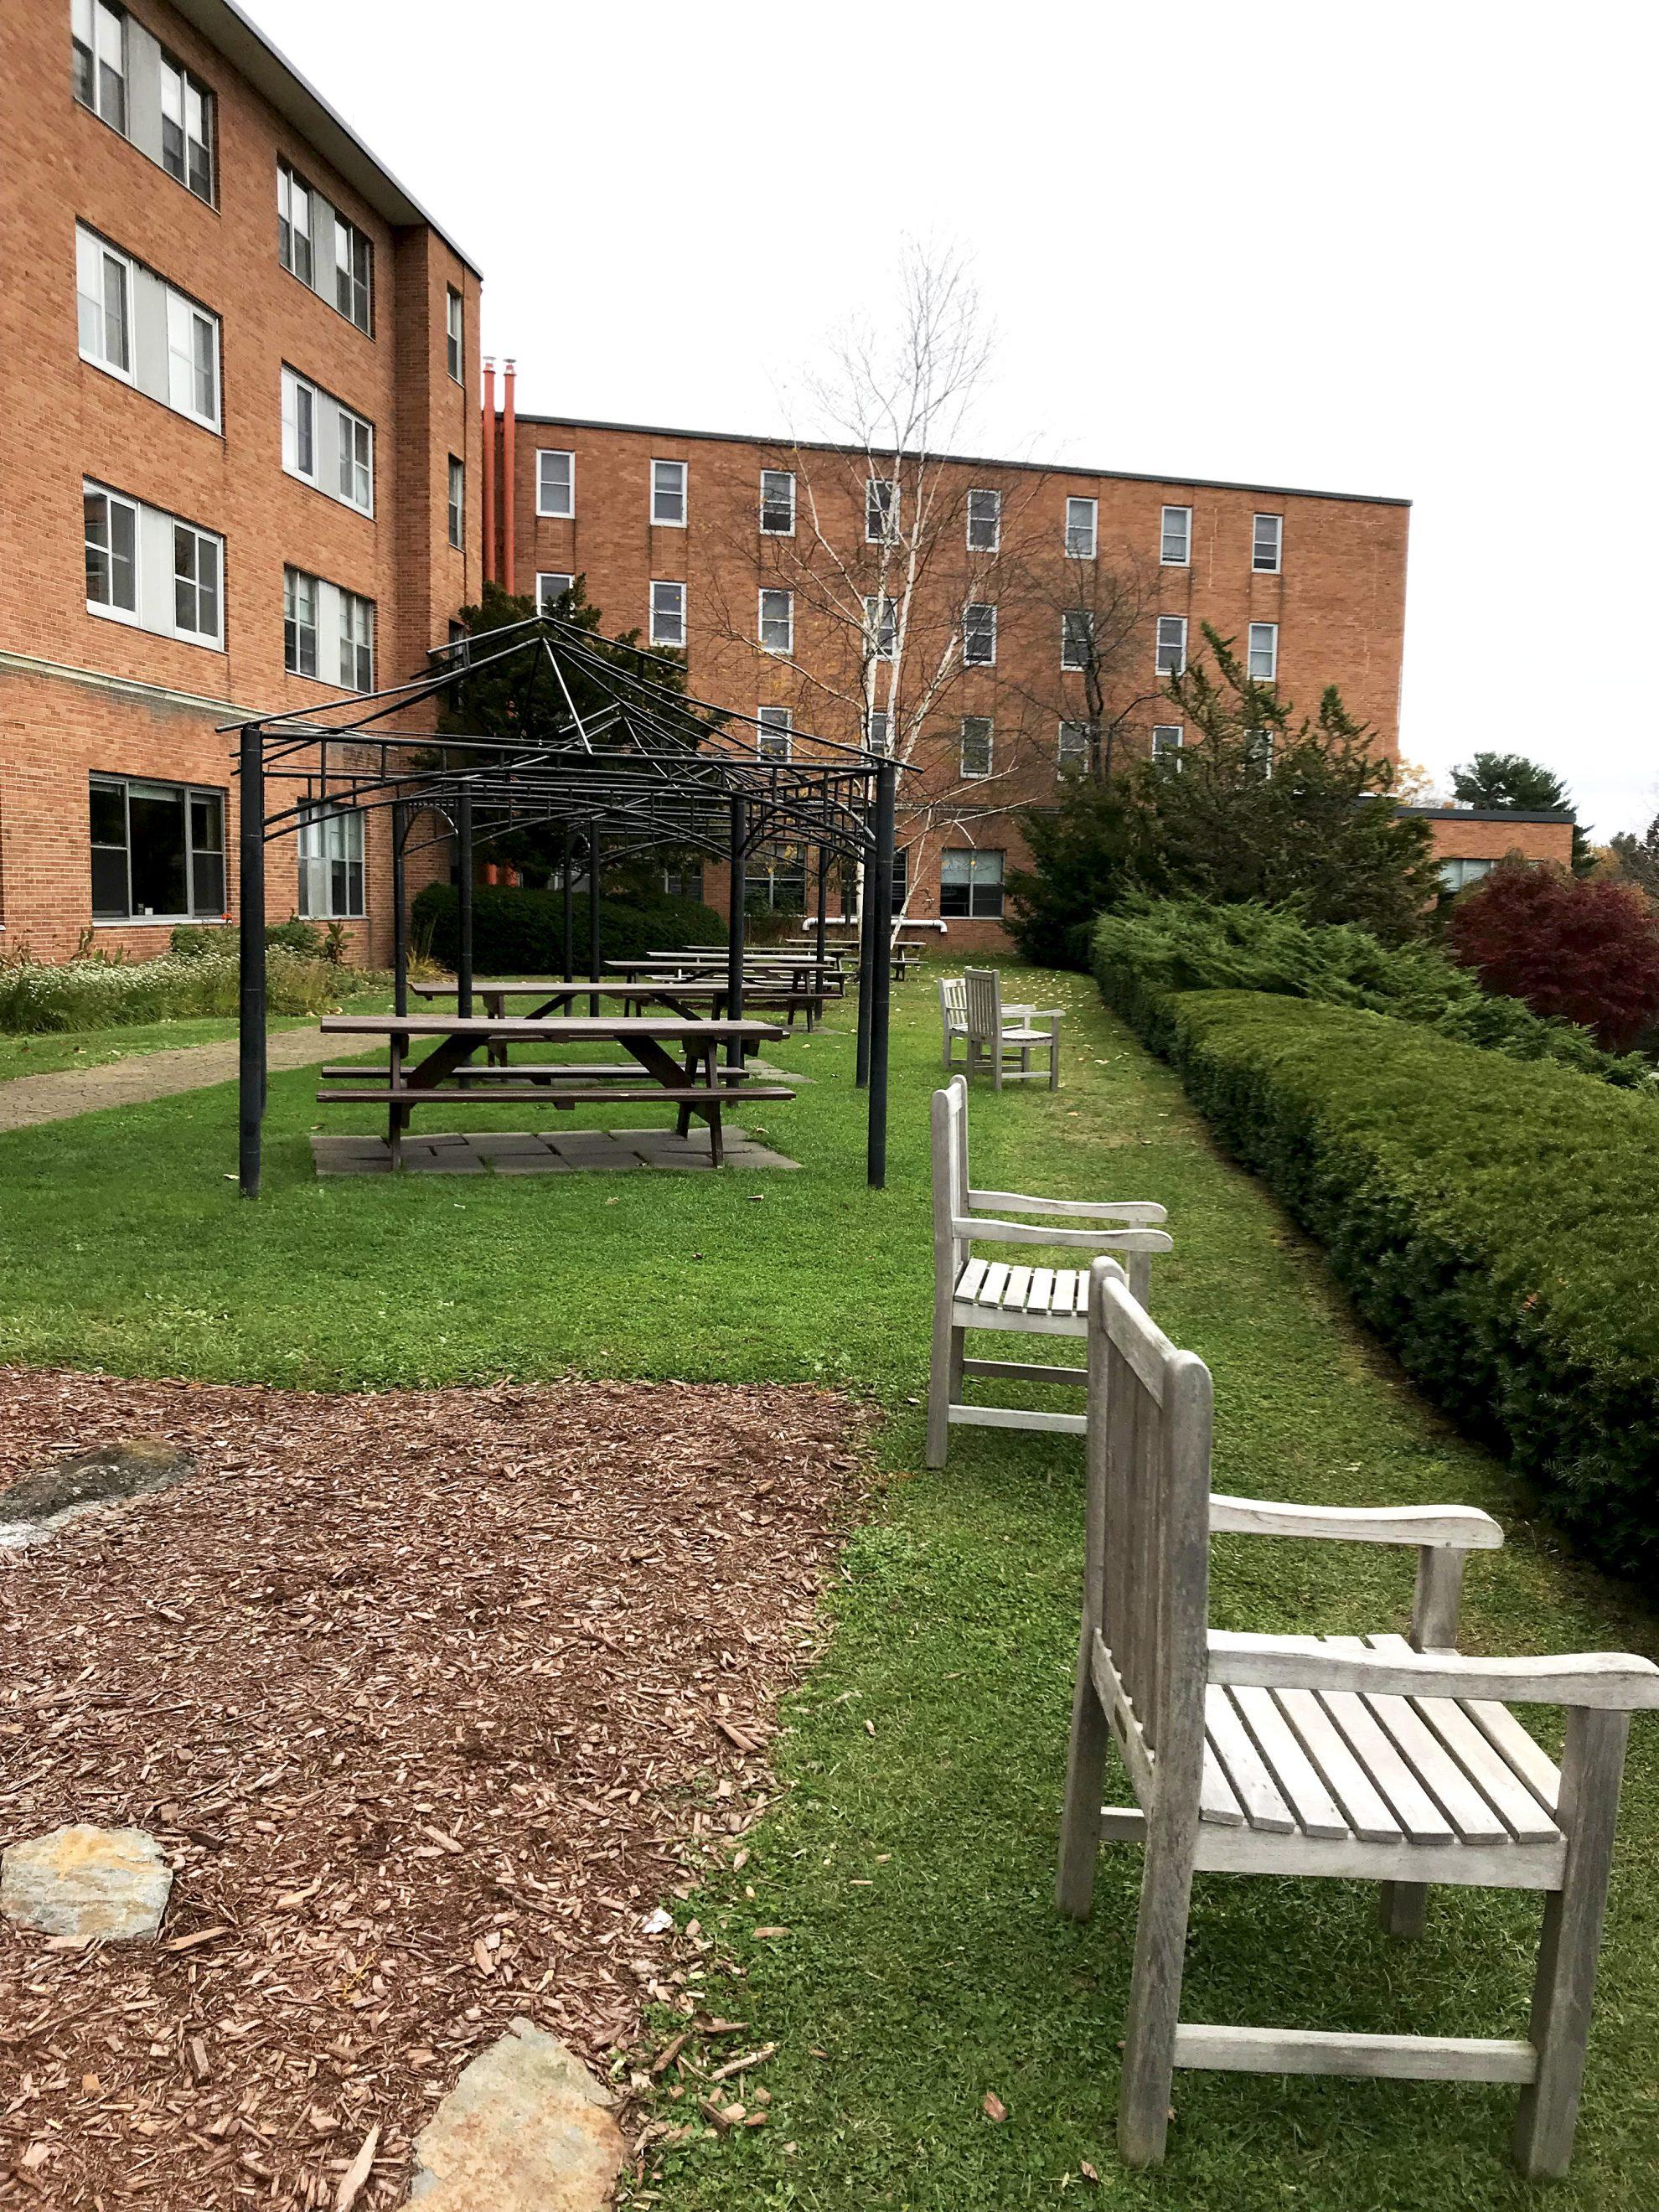 Brick building and benches at Kripalu Center Retreats